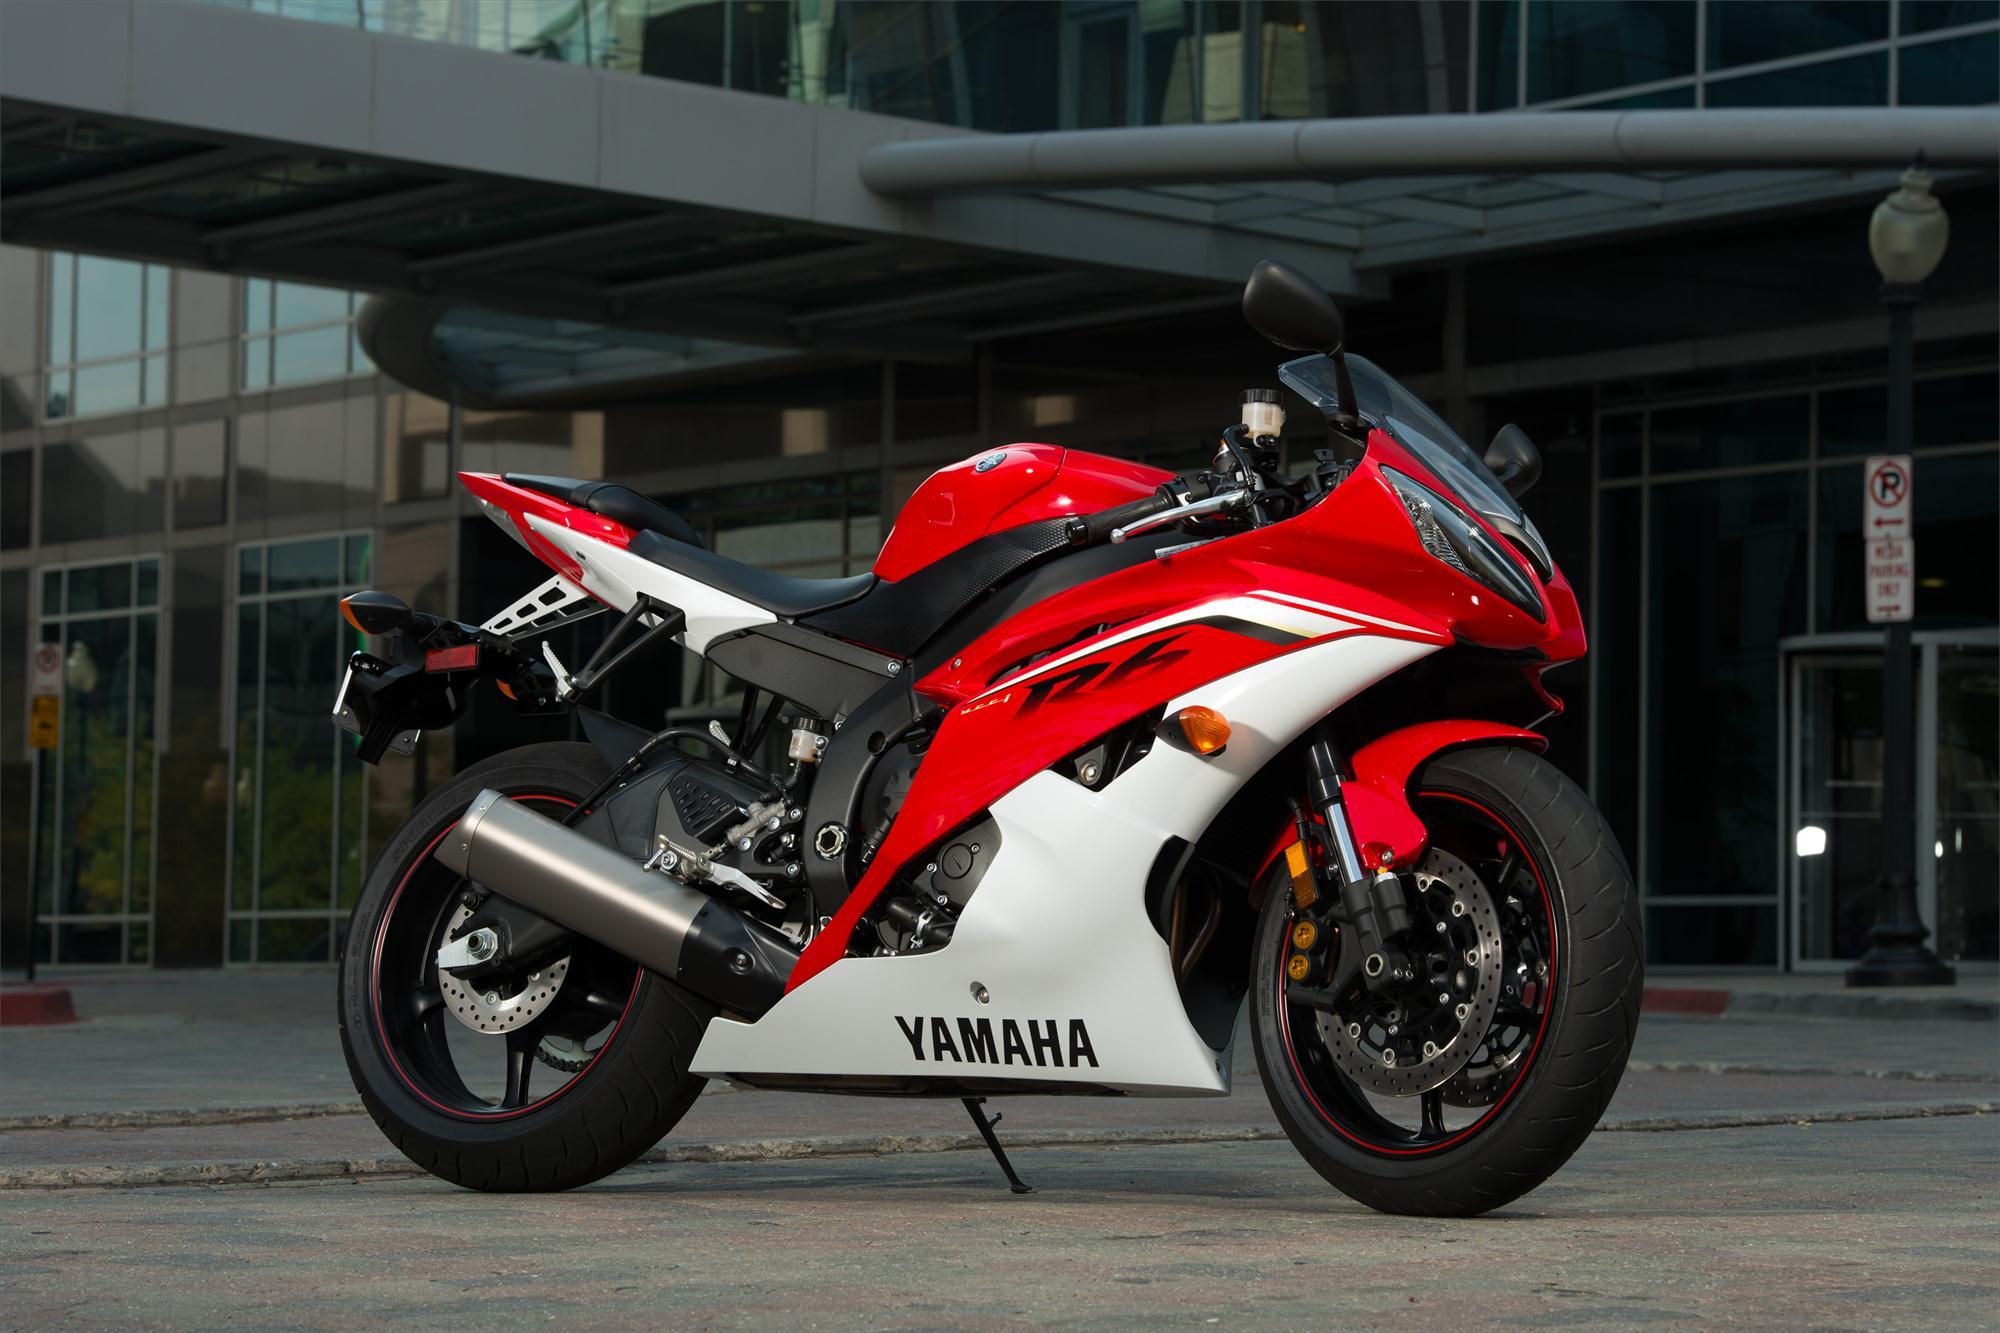 2013 Yamaha Yzf R6 City And Track Aggression Ready